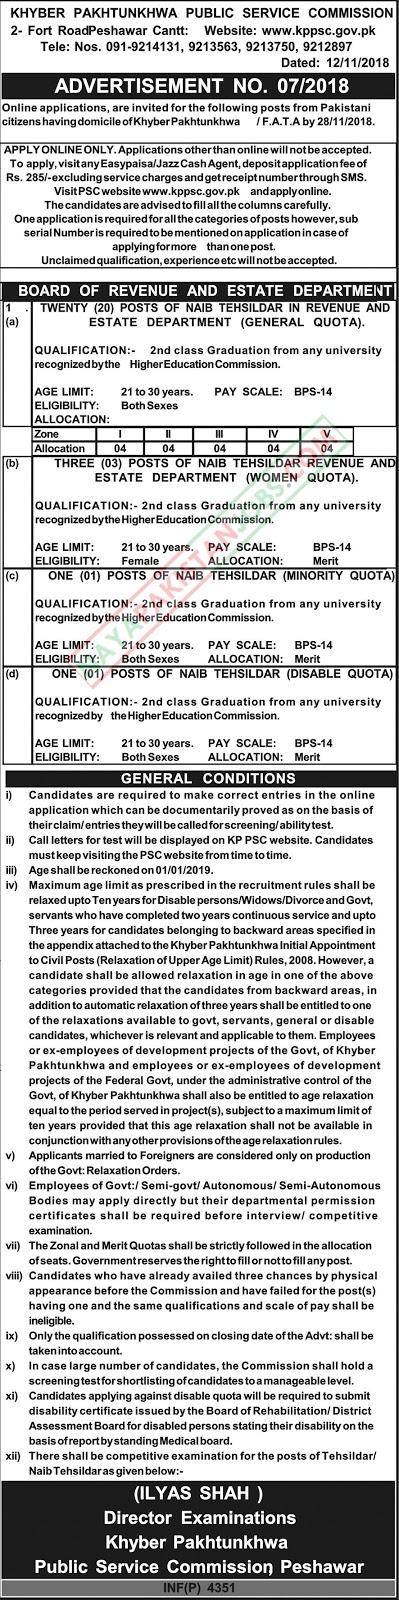 KPPSC Jobs Nov 2018 | Khyber Pakhtunkhwa Public Service Commission